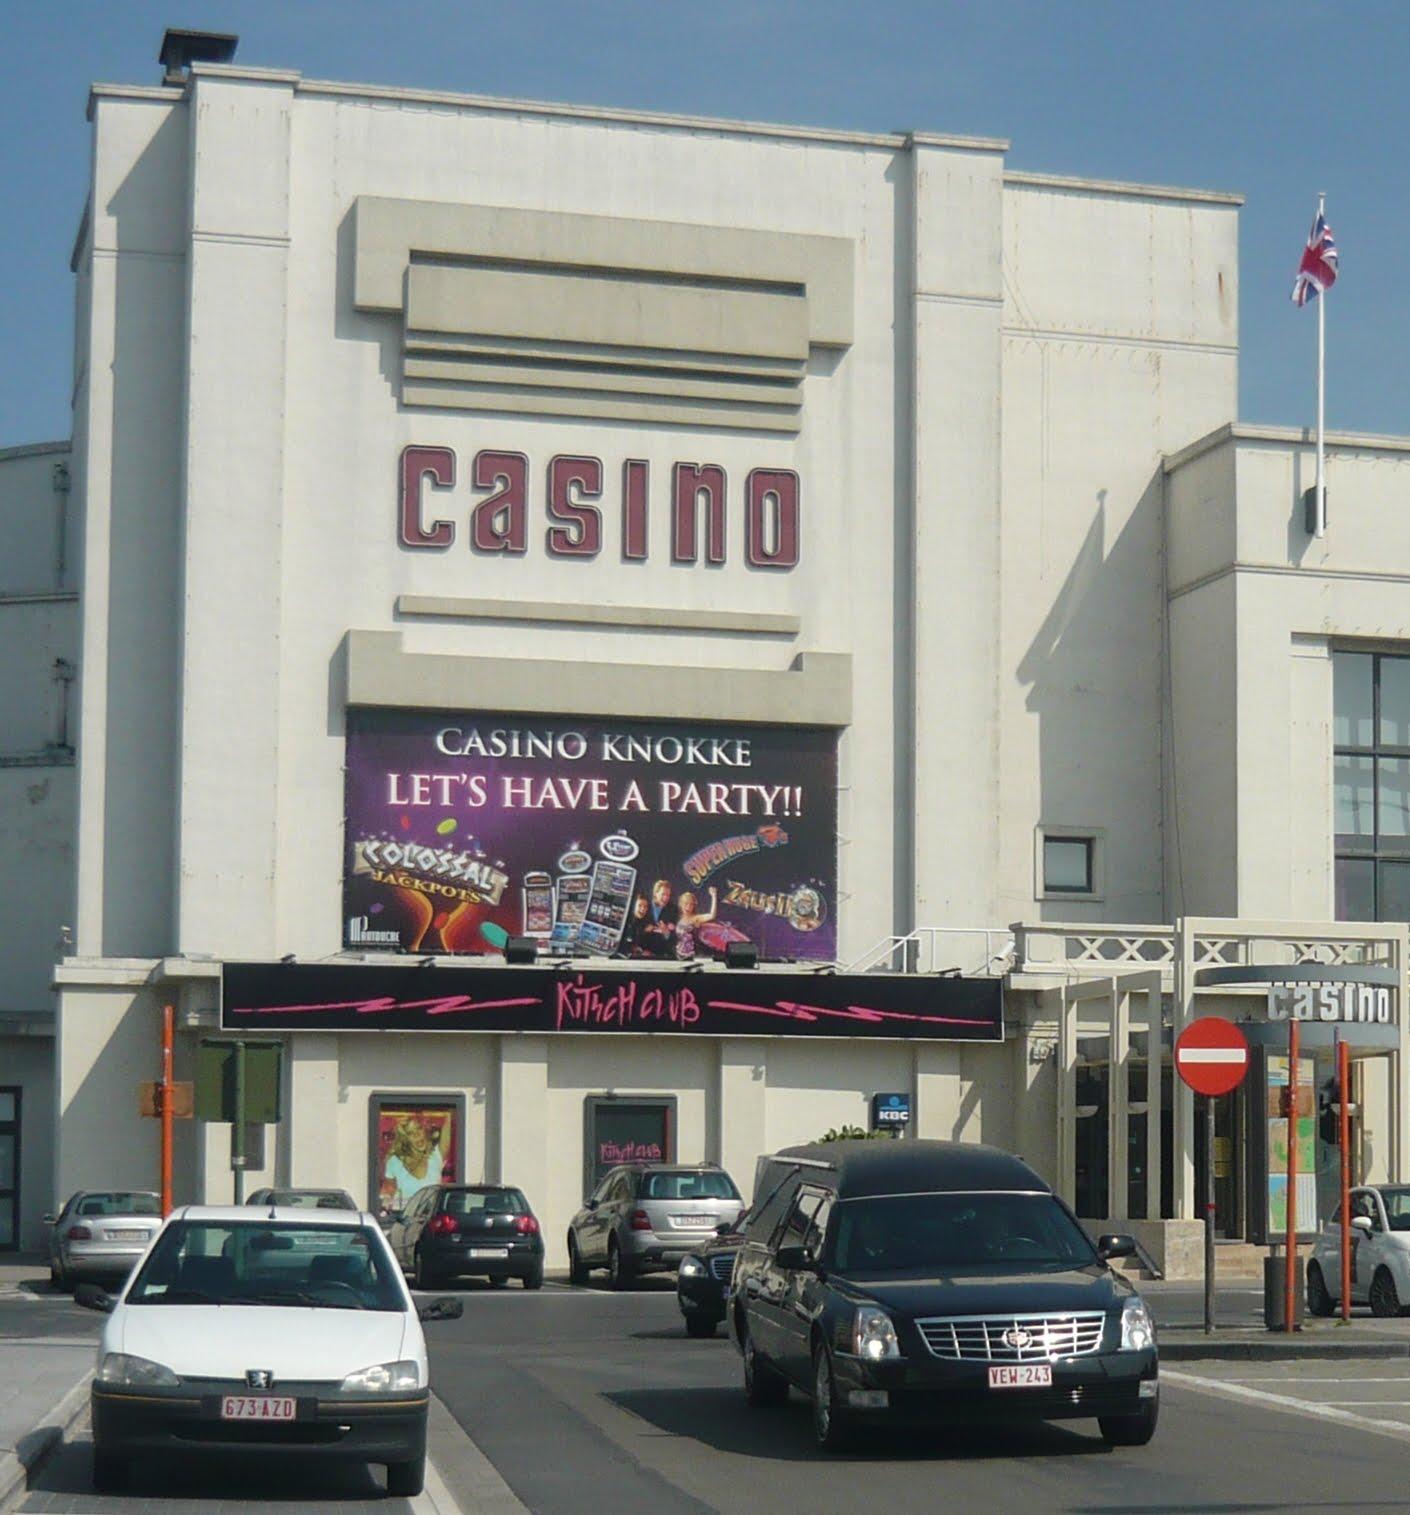 De Casinos Knokke